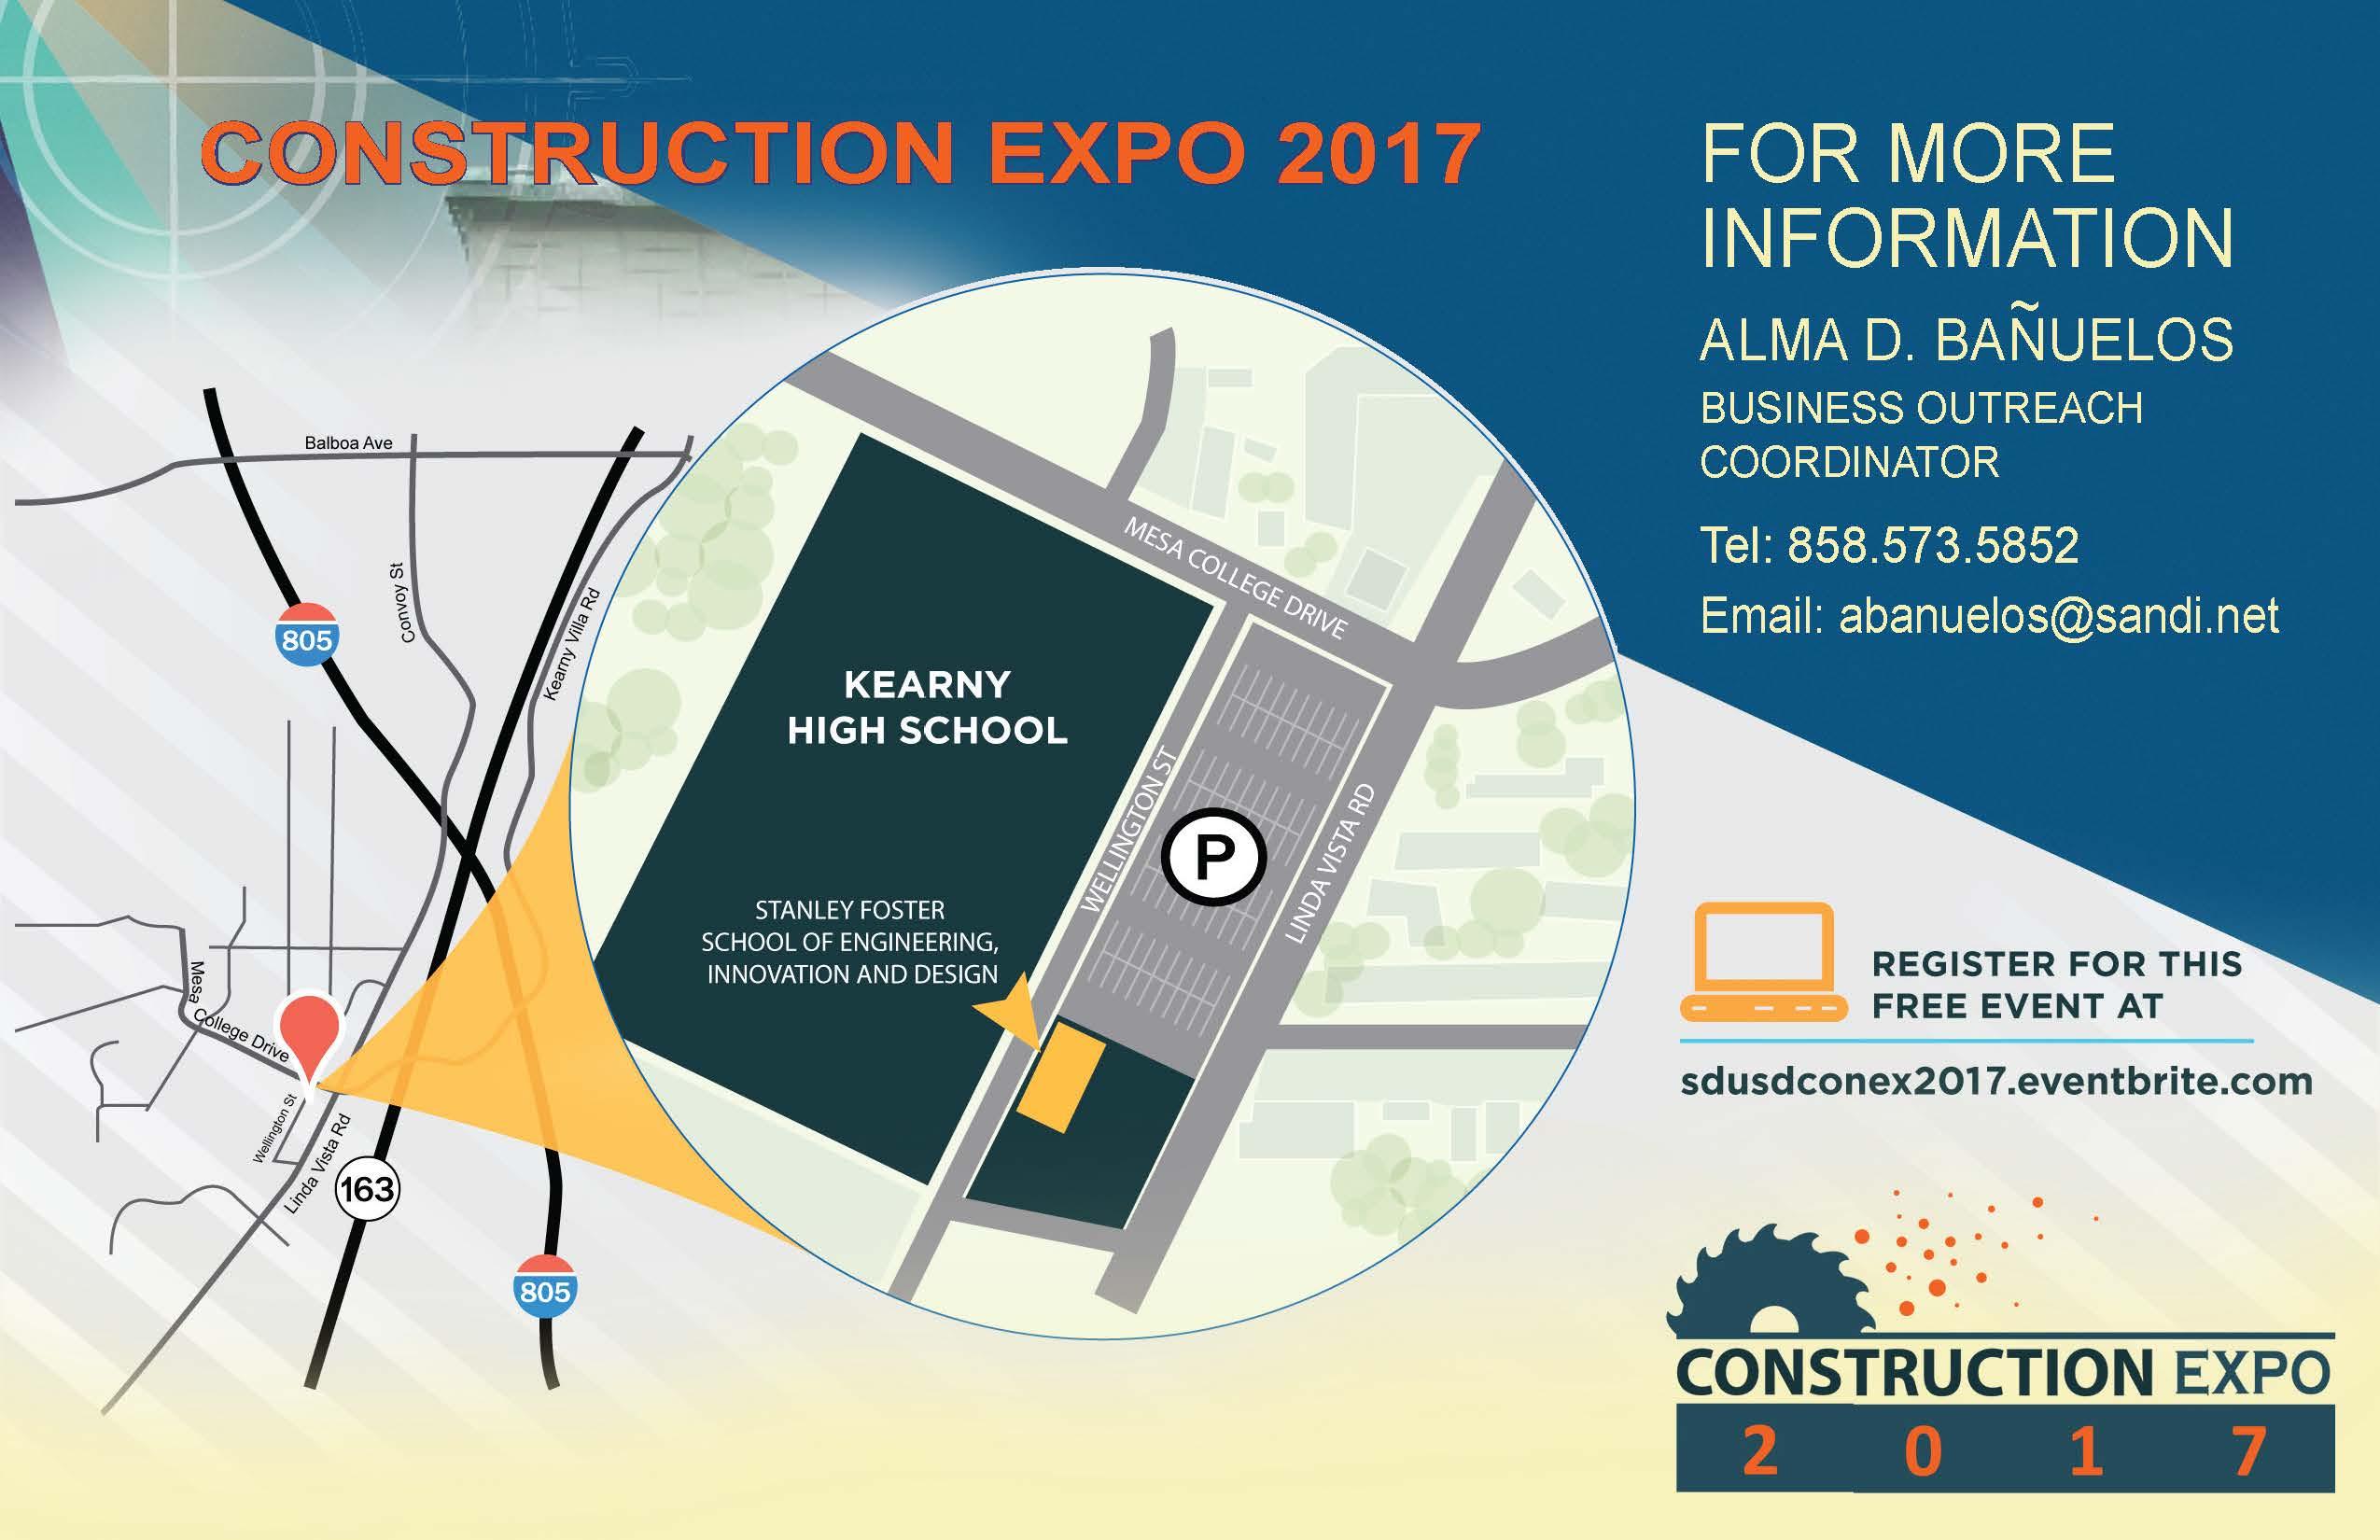 SDUSD Construction Expo 2017 Map